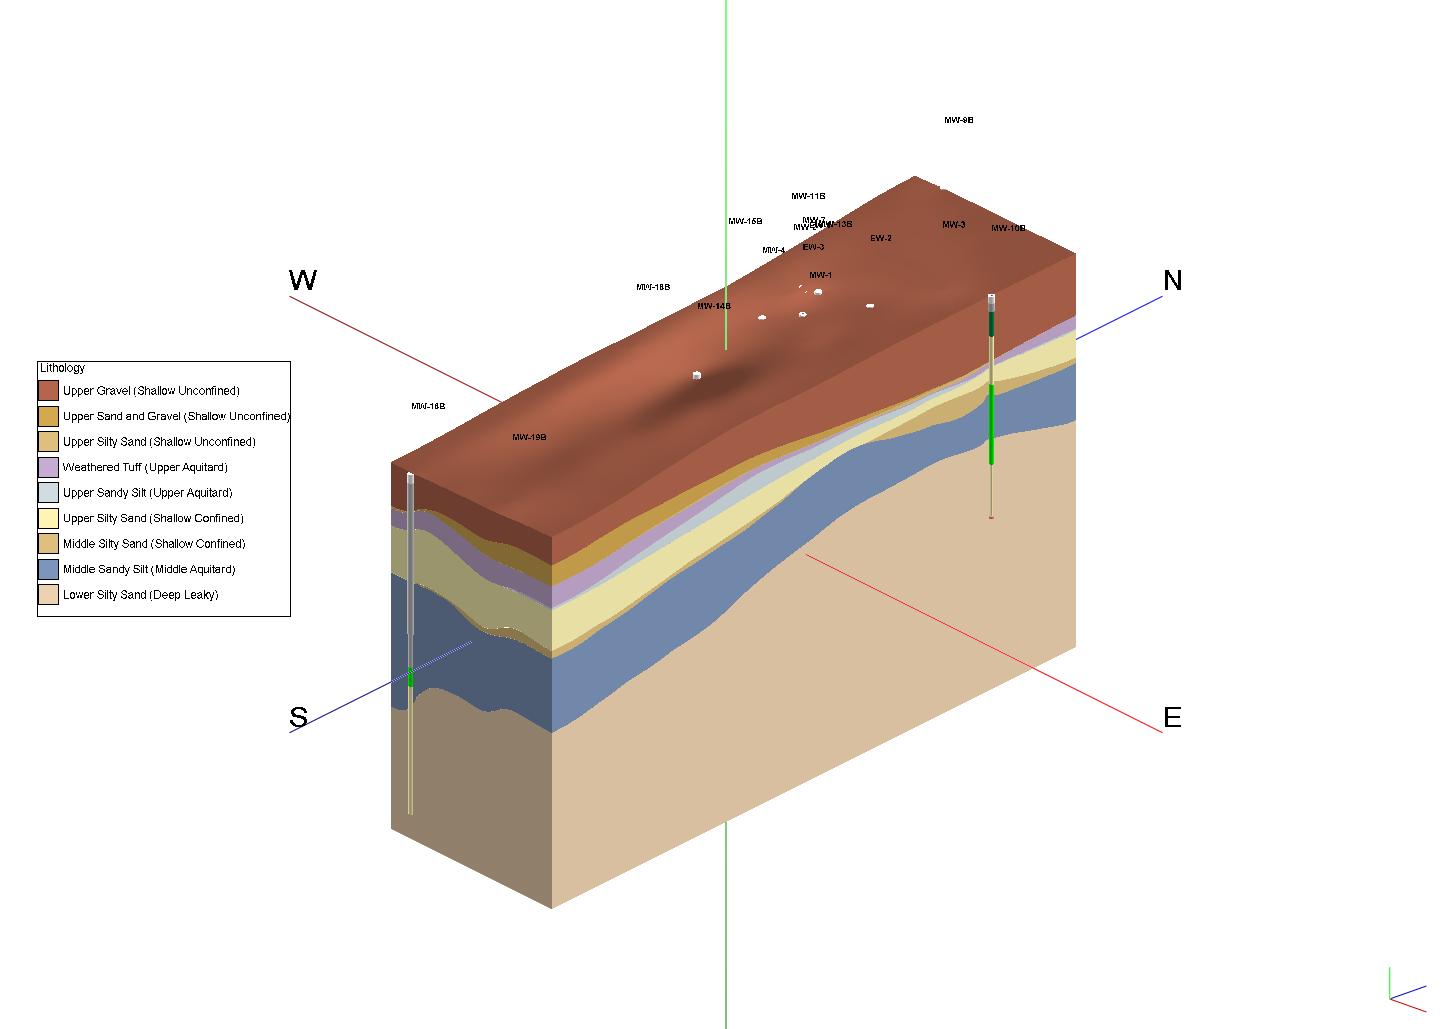 former_gills_gas_block_diagram